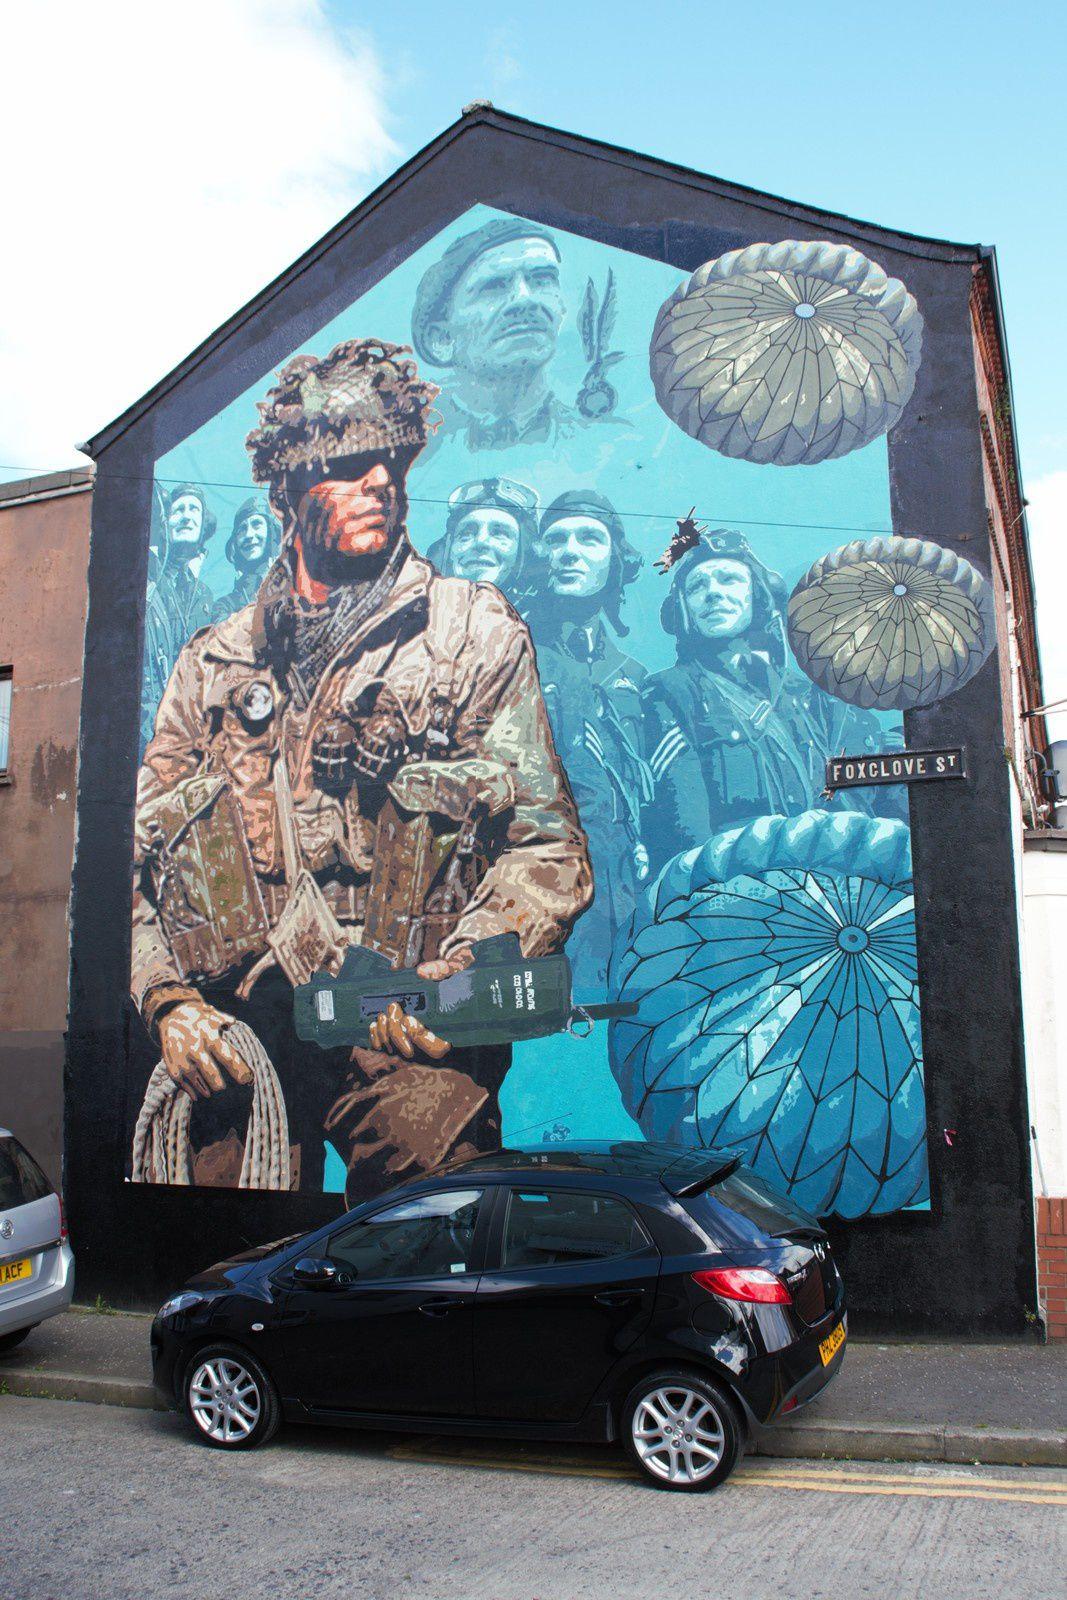 669) Foxglove street, East Belfast